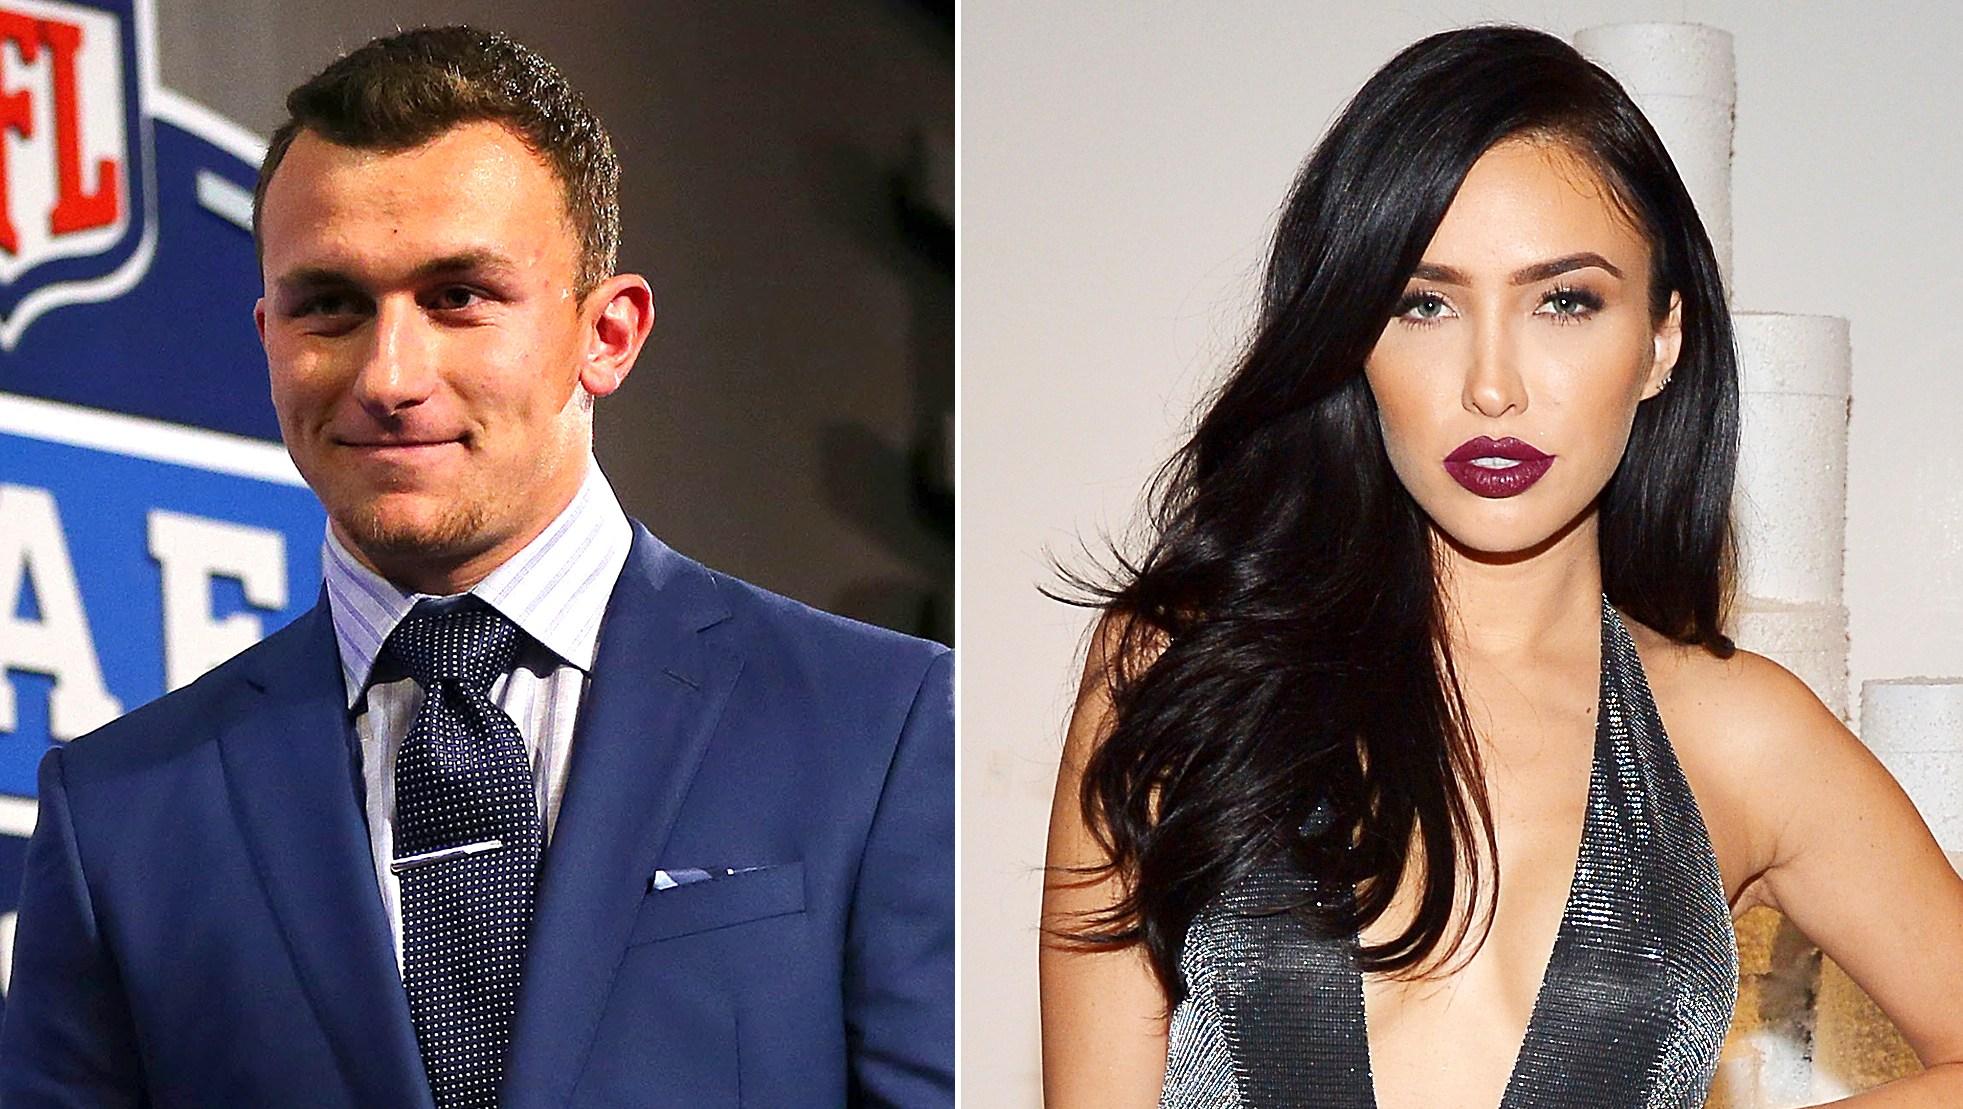 Johnny Manziel and Wife Bre Tiesi Spark Split Rumors After Peculiar Instagram Activity